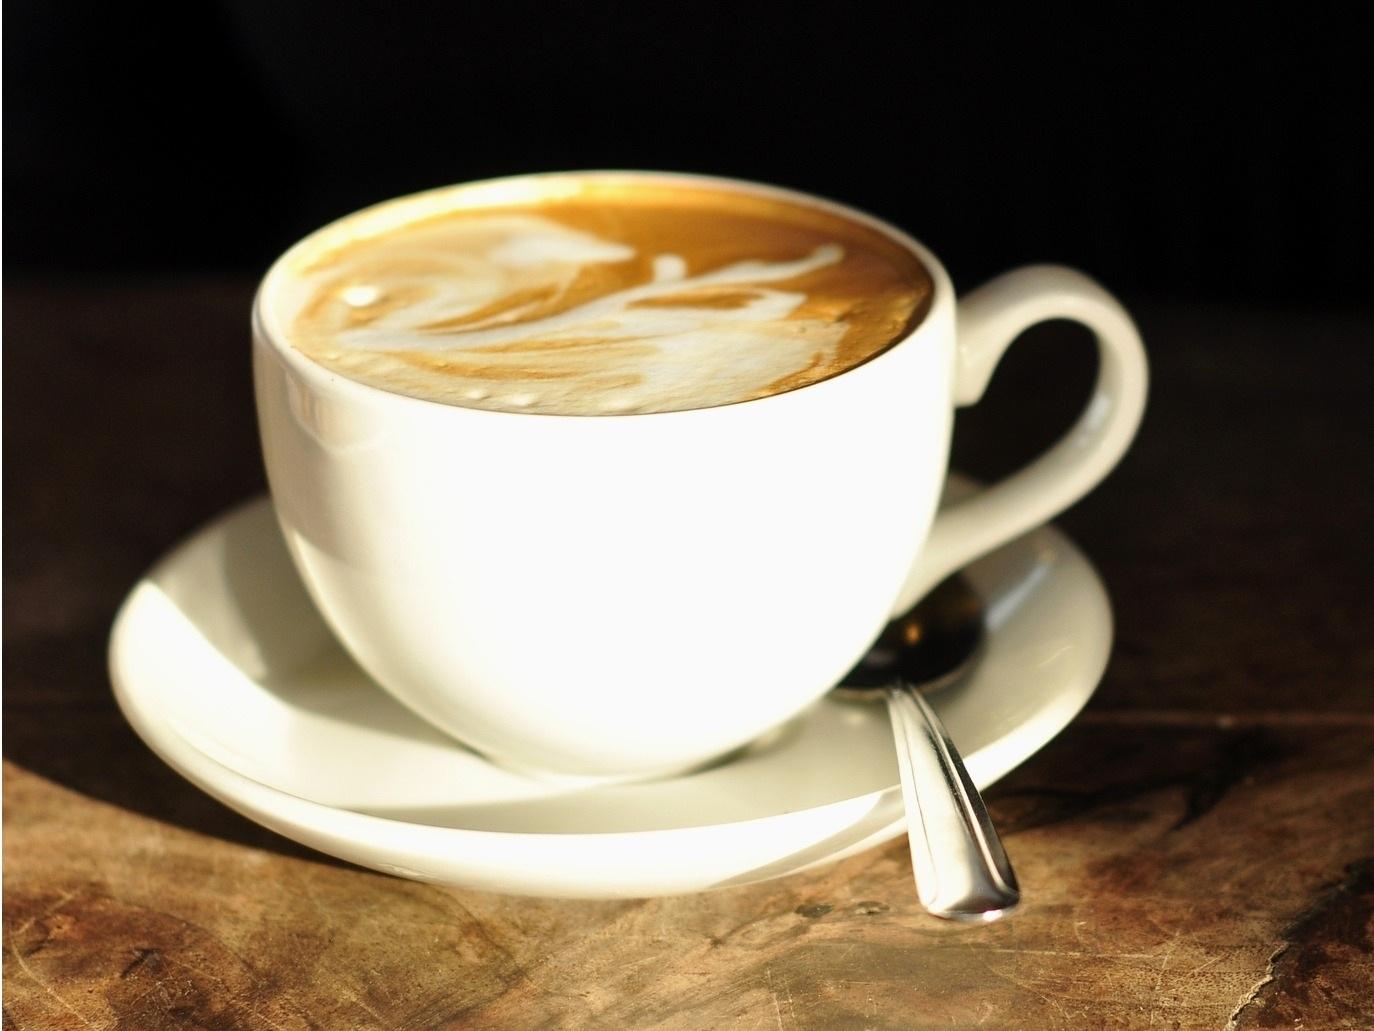 coffee_06.jpg